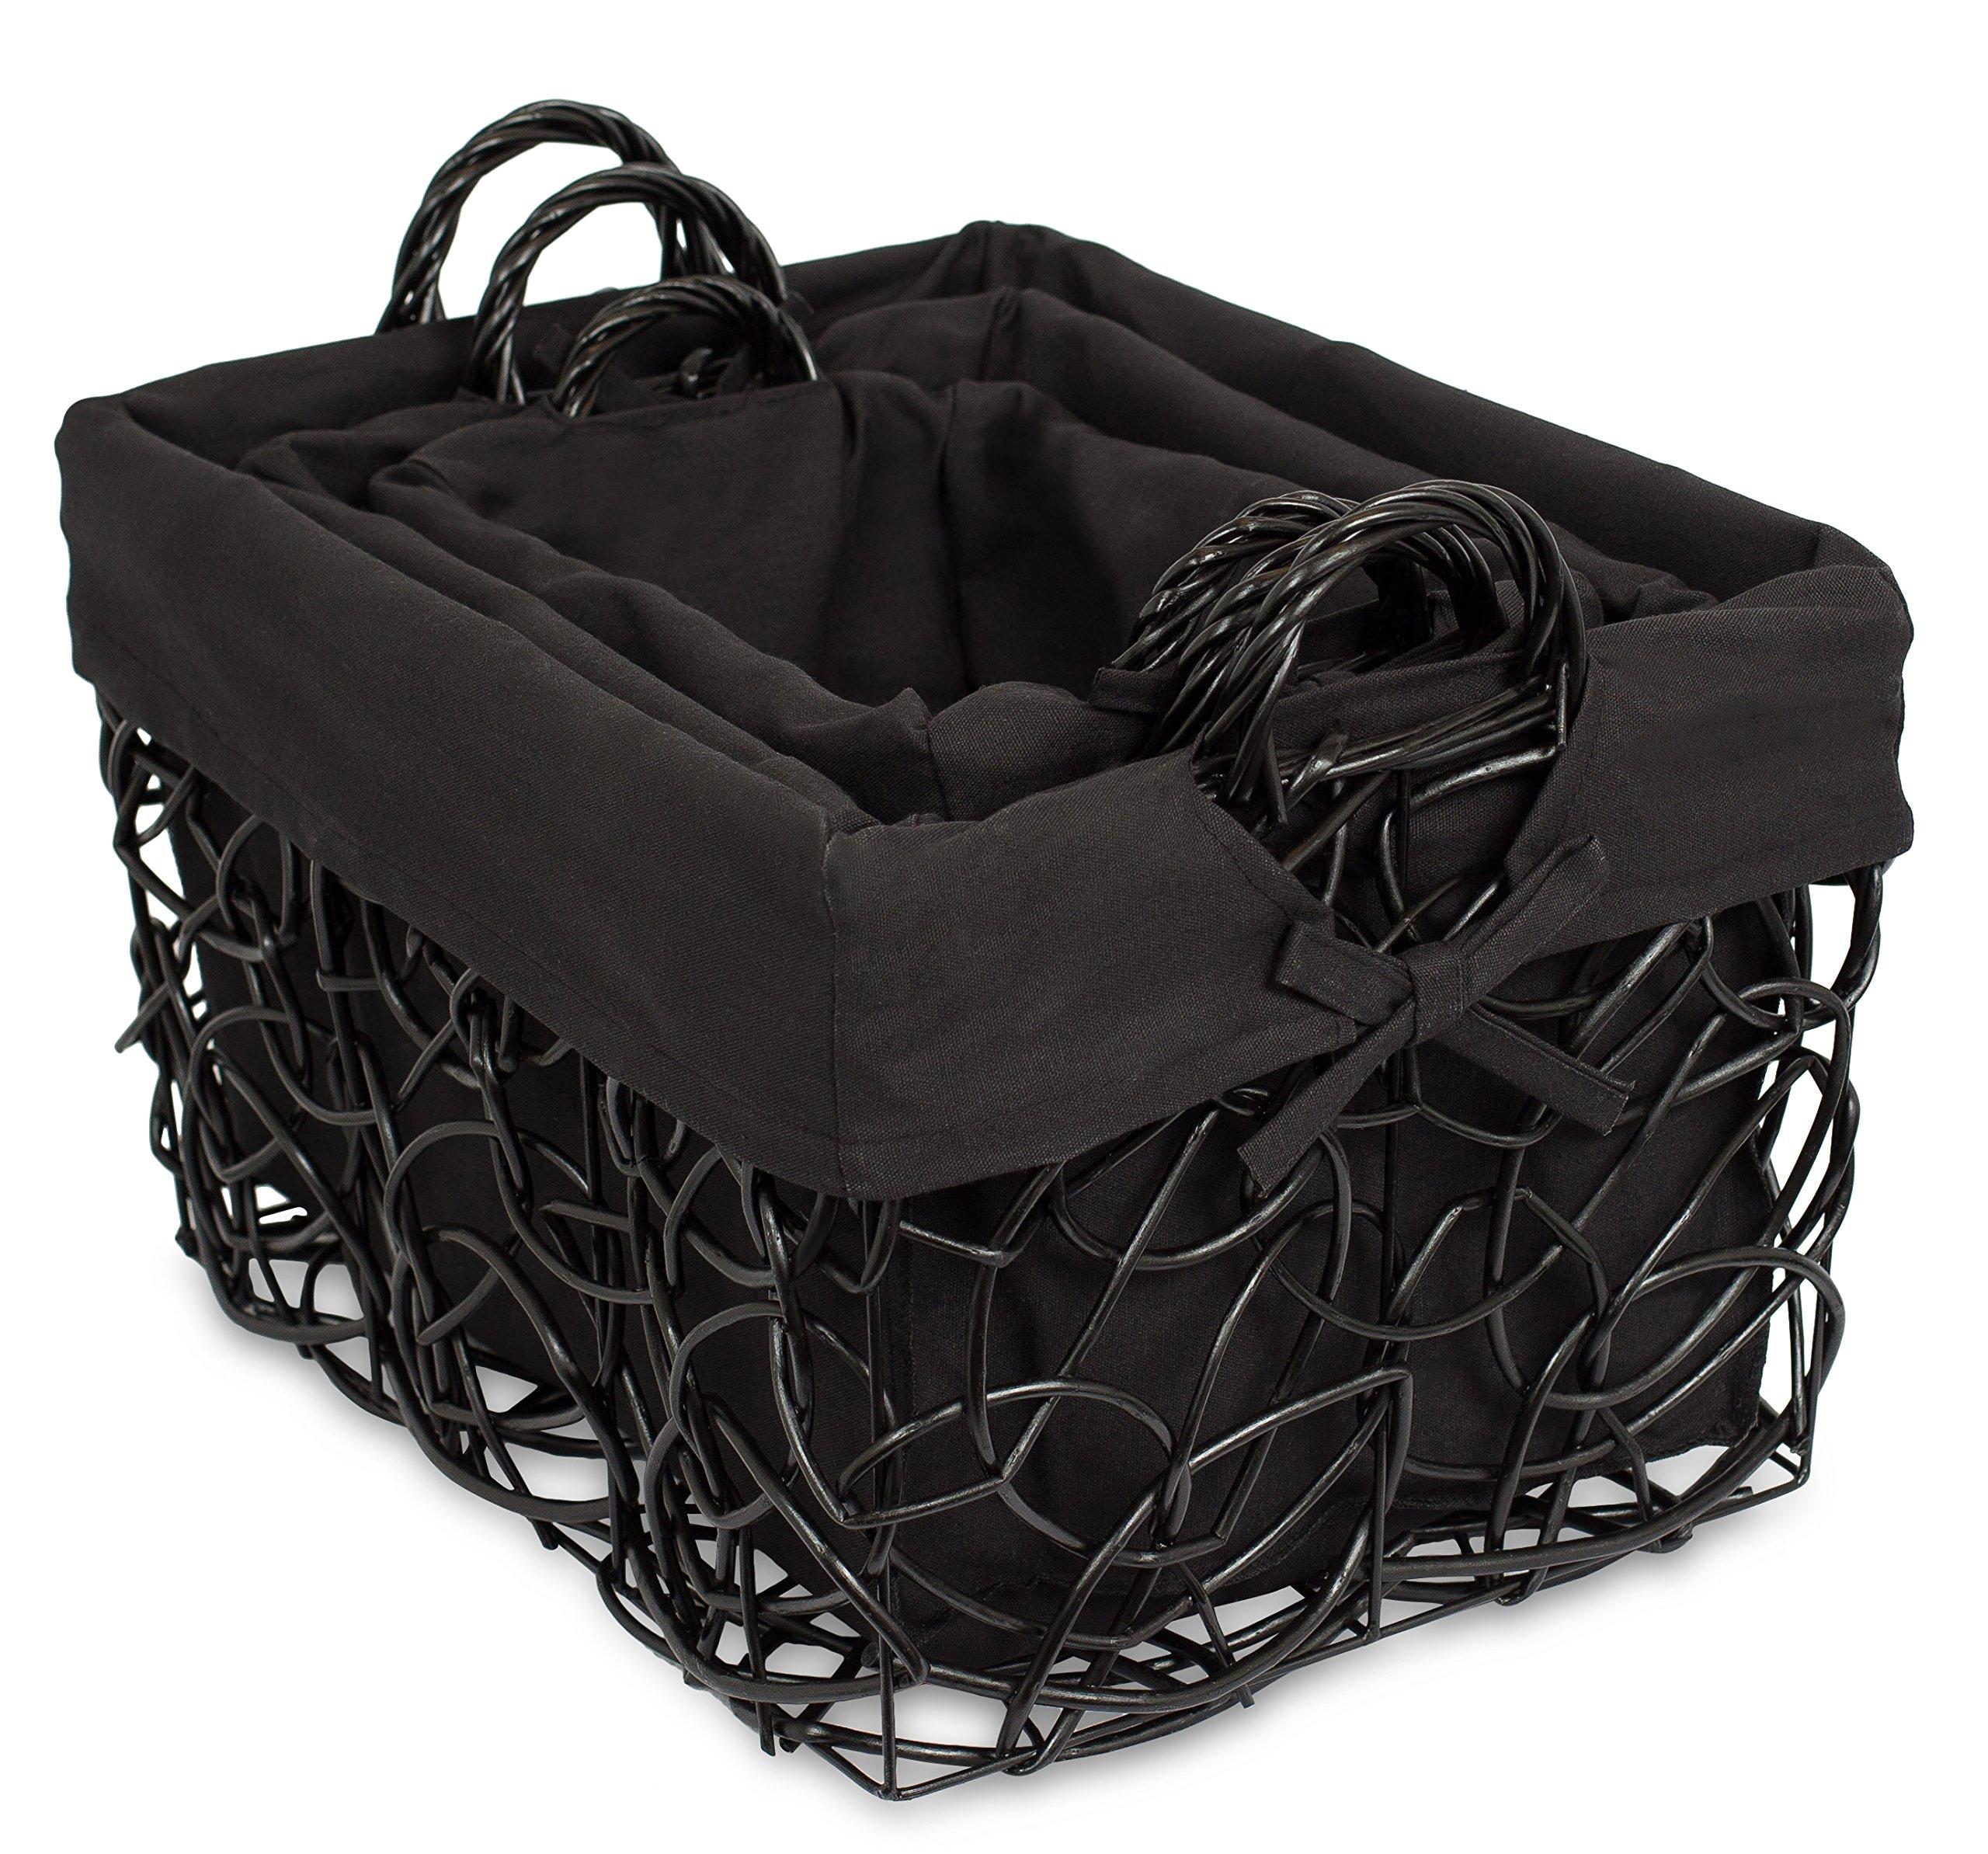 BirdRock Home Decorative Willow Basket Set with Liner | Set of 3 | Double Handle Wooden Basket | Rectangular Wicker Storage Bin | Black